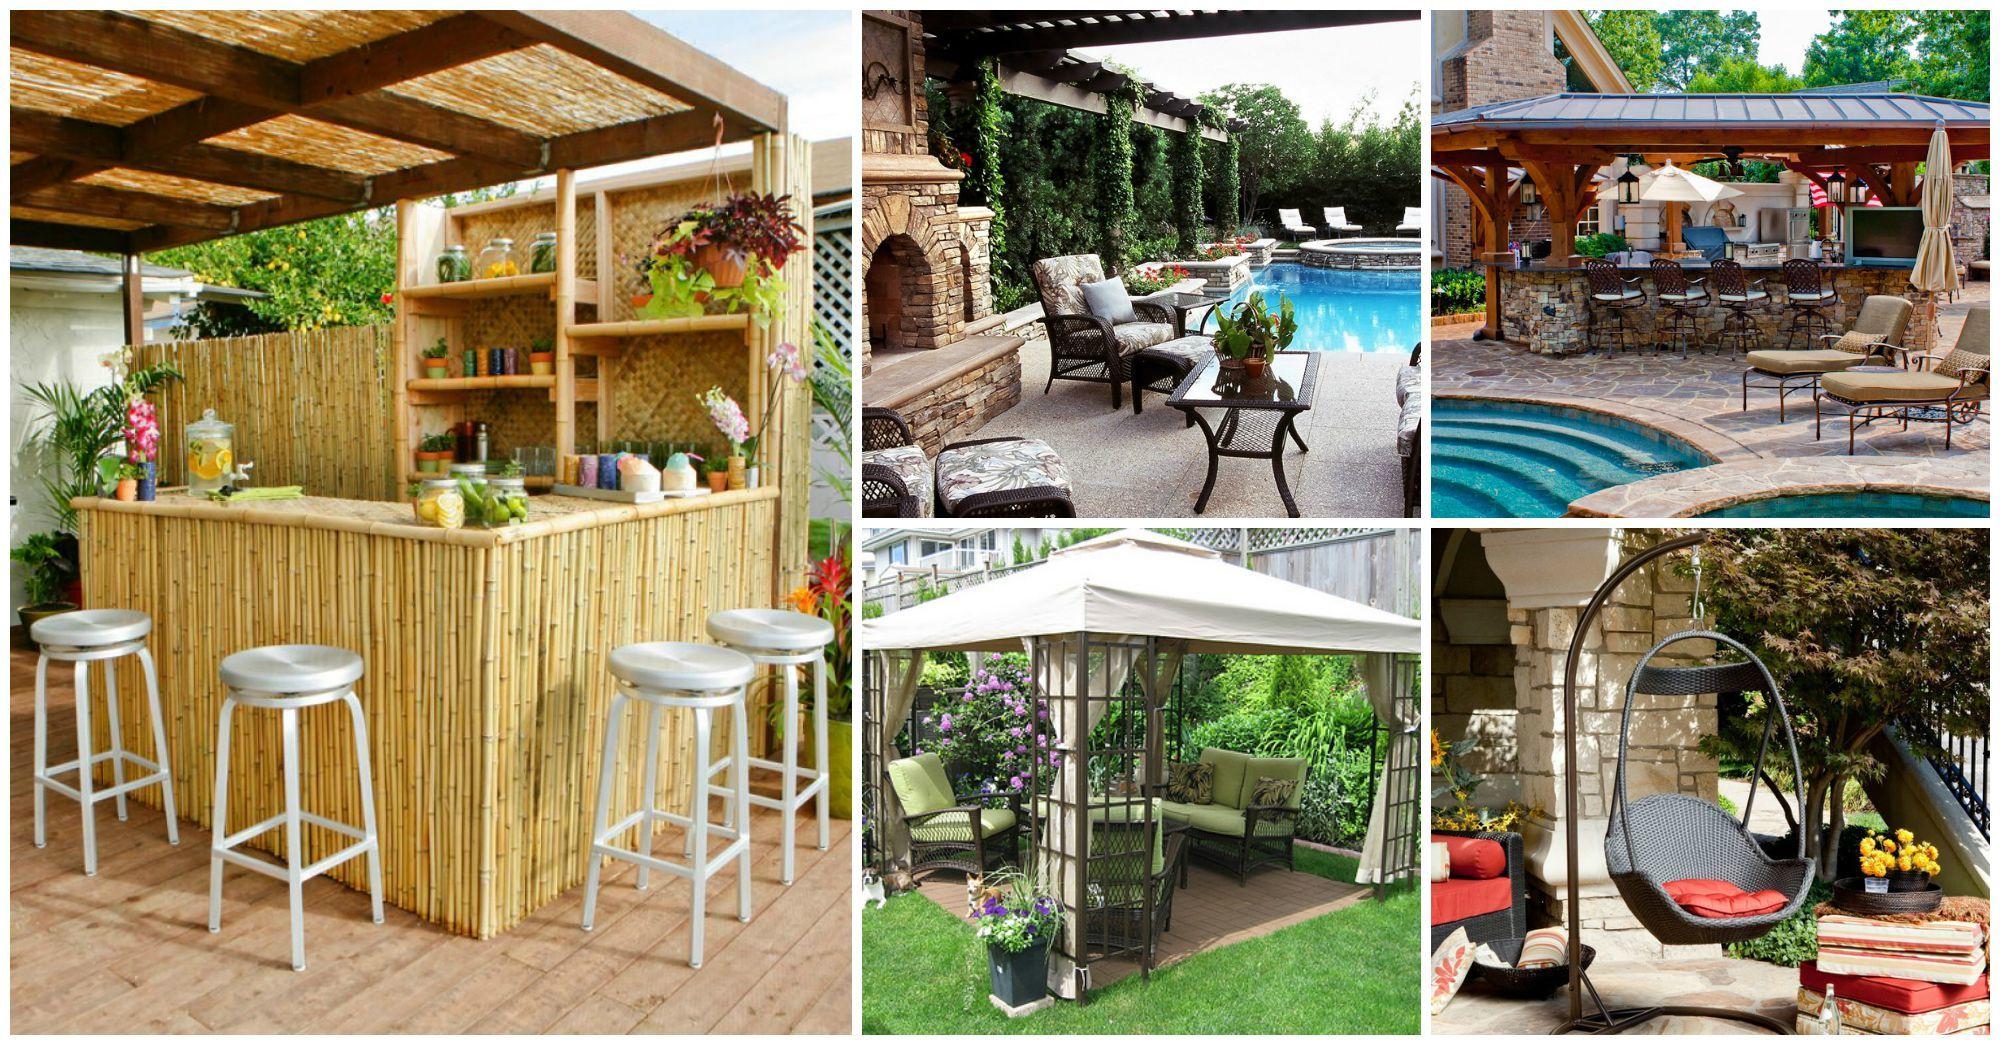 10 Amazing Backyard Ideas to Spruce Up Your Property